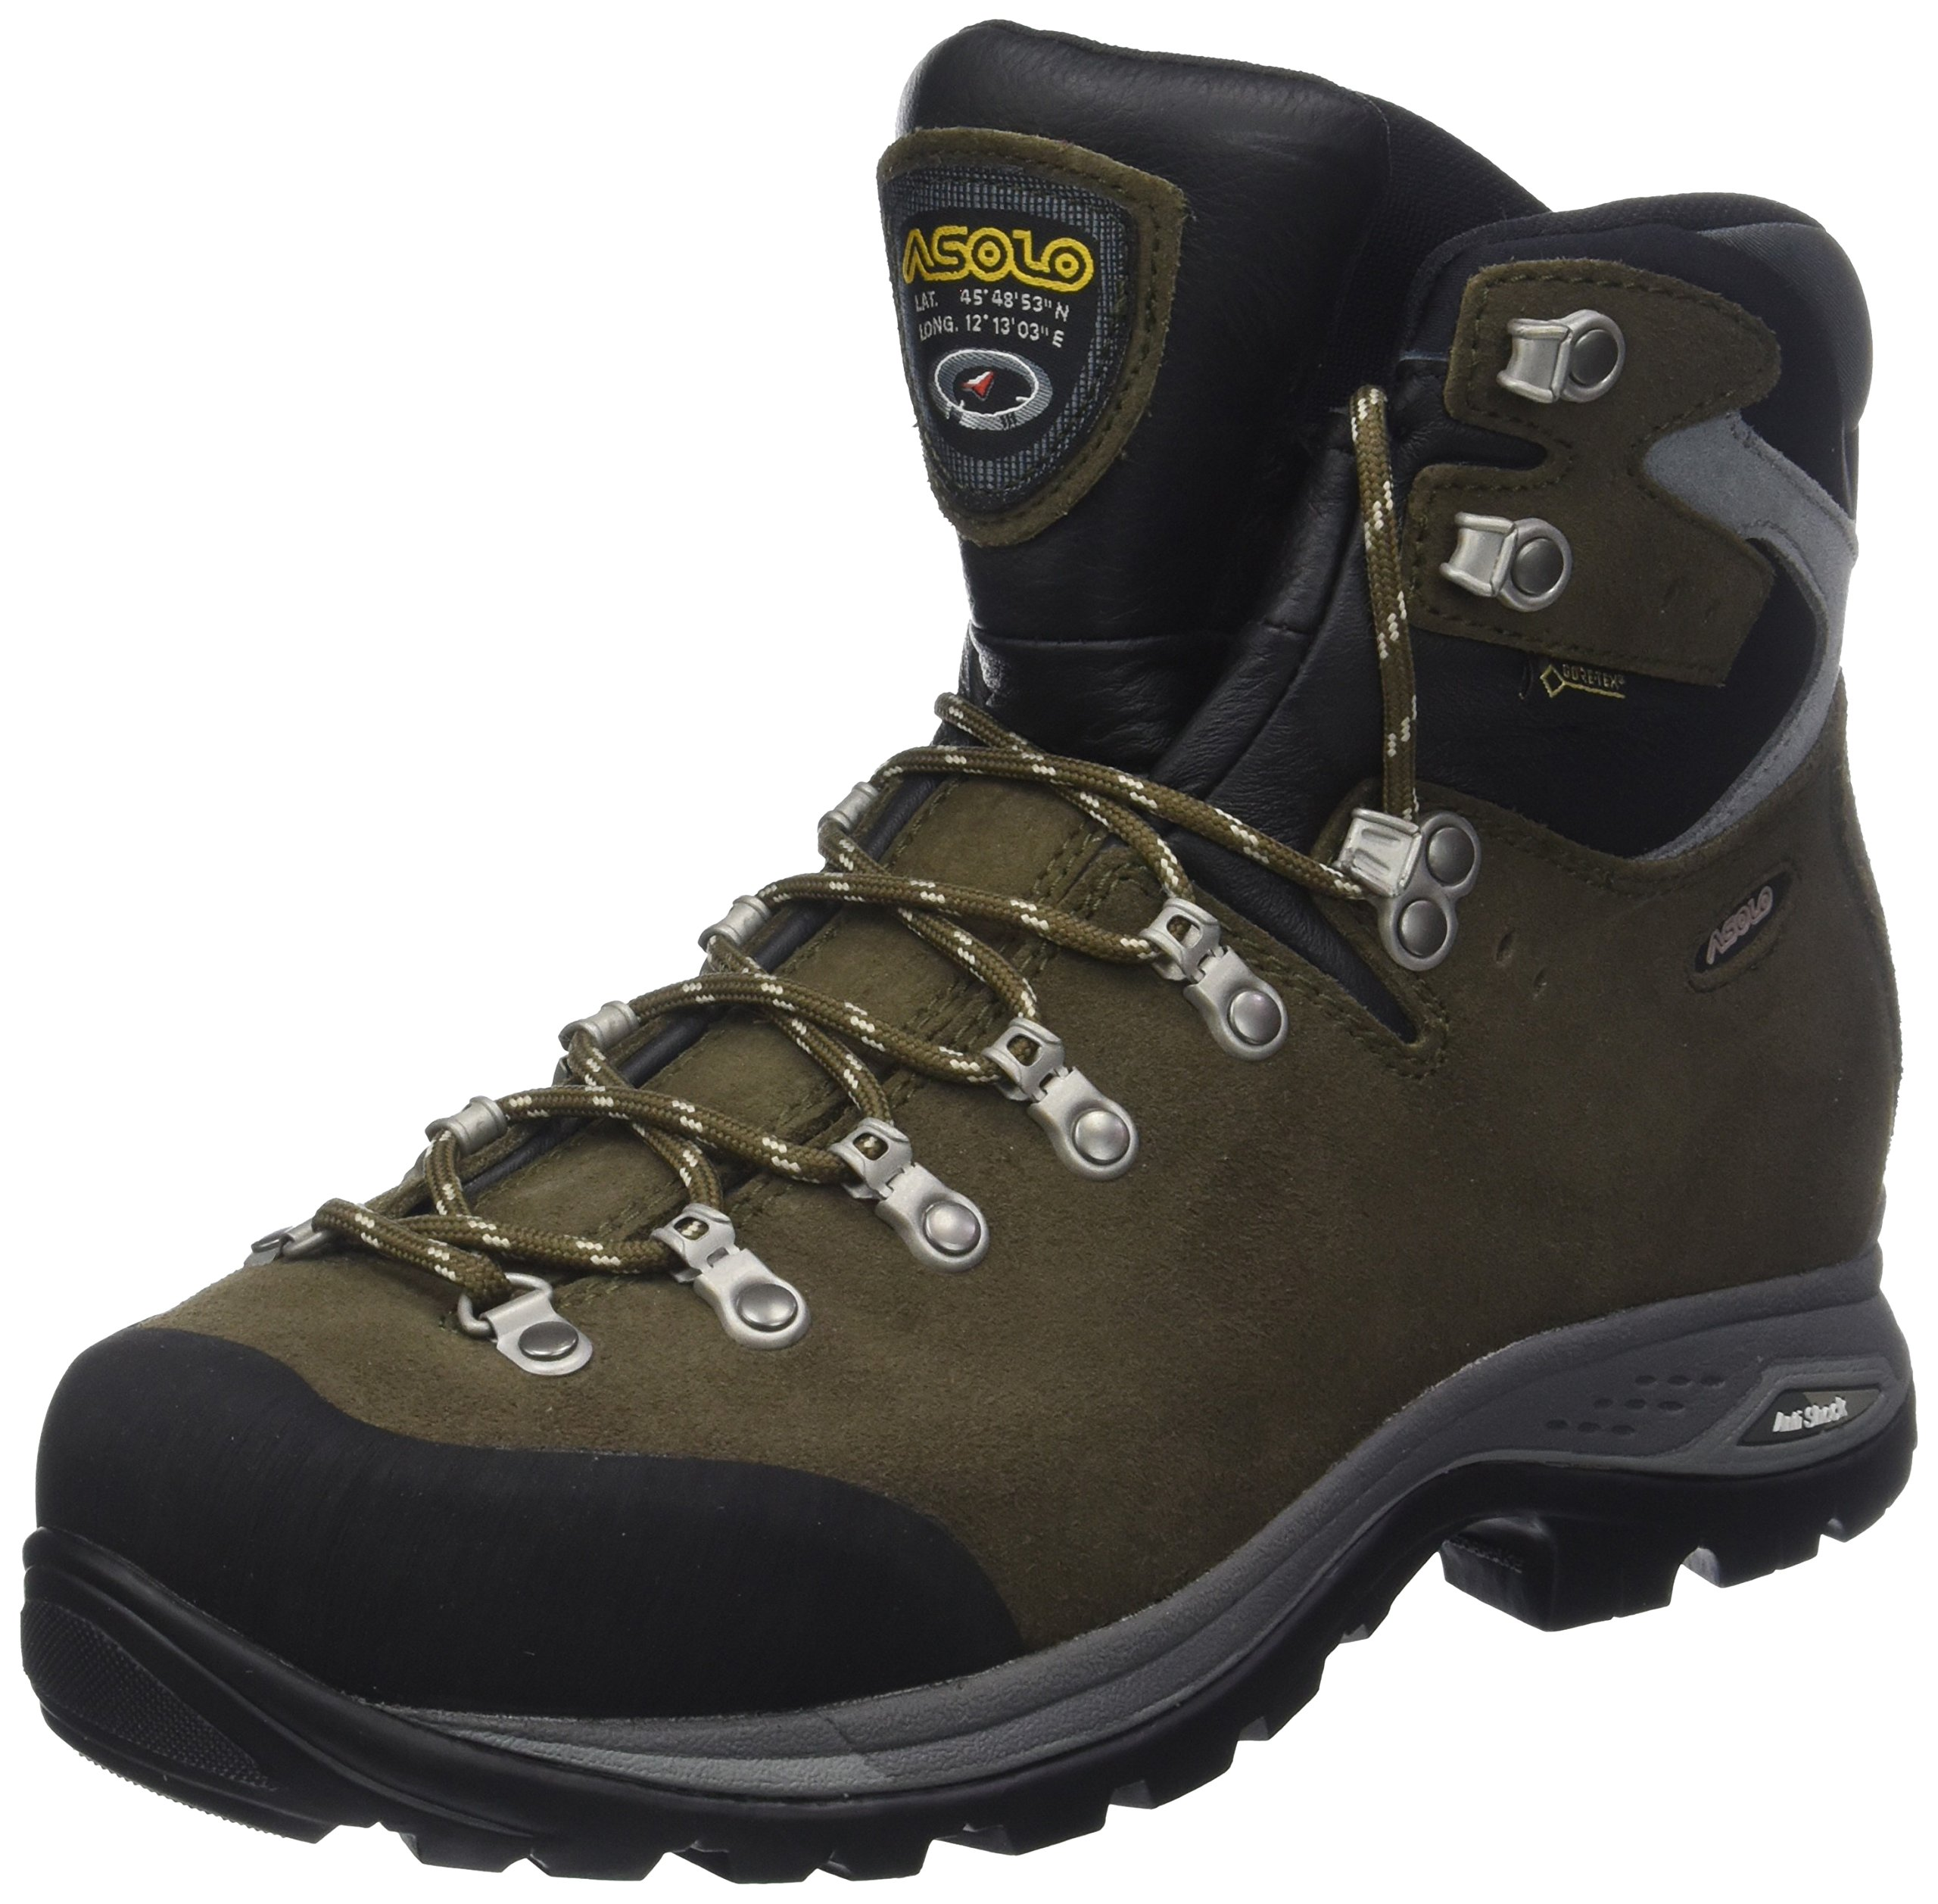 Hautes De Major AsoloA23094 1 Homme A03443 Chaussures Eu Randonnée 3 Marronarnum Brown 54L3jAR